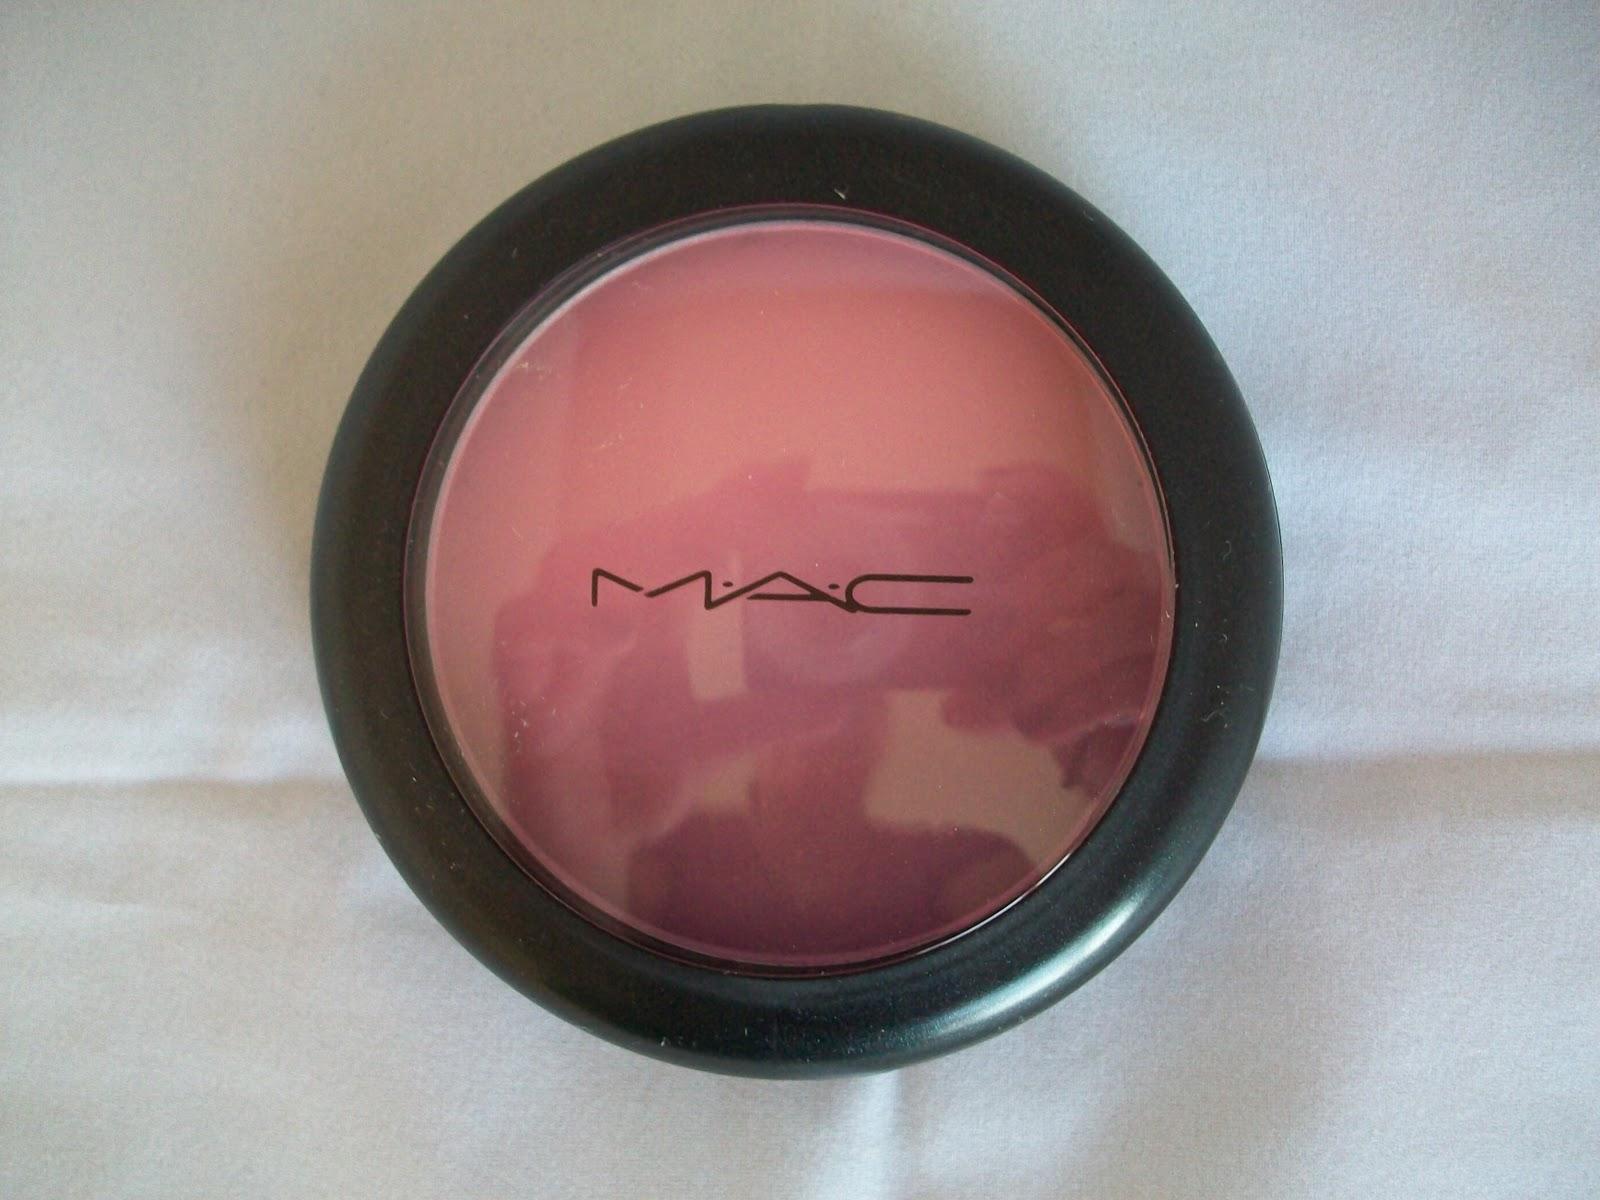 mac azalea blossom blush - photo #27